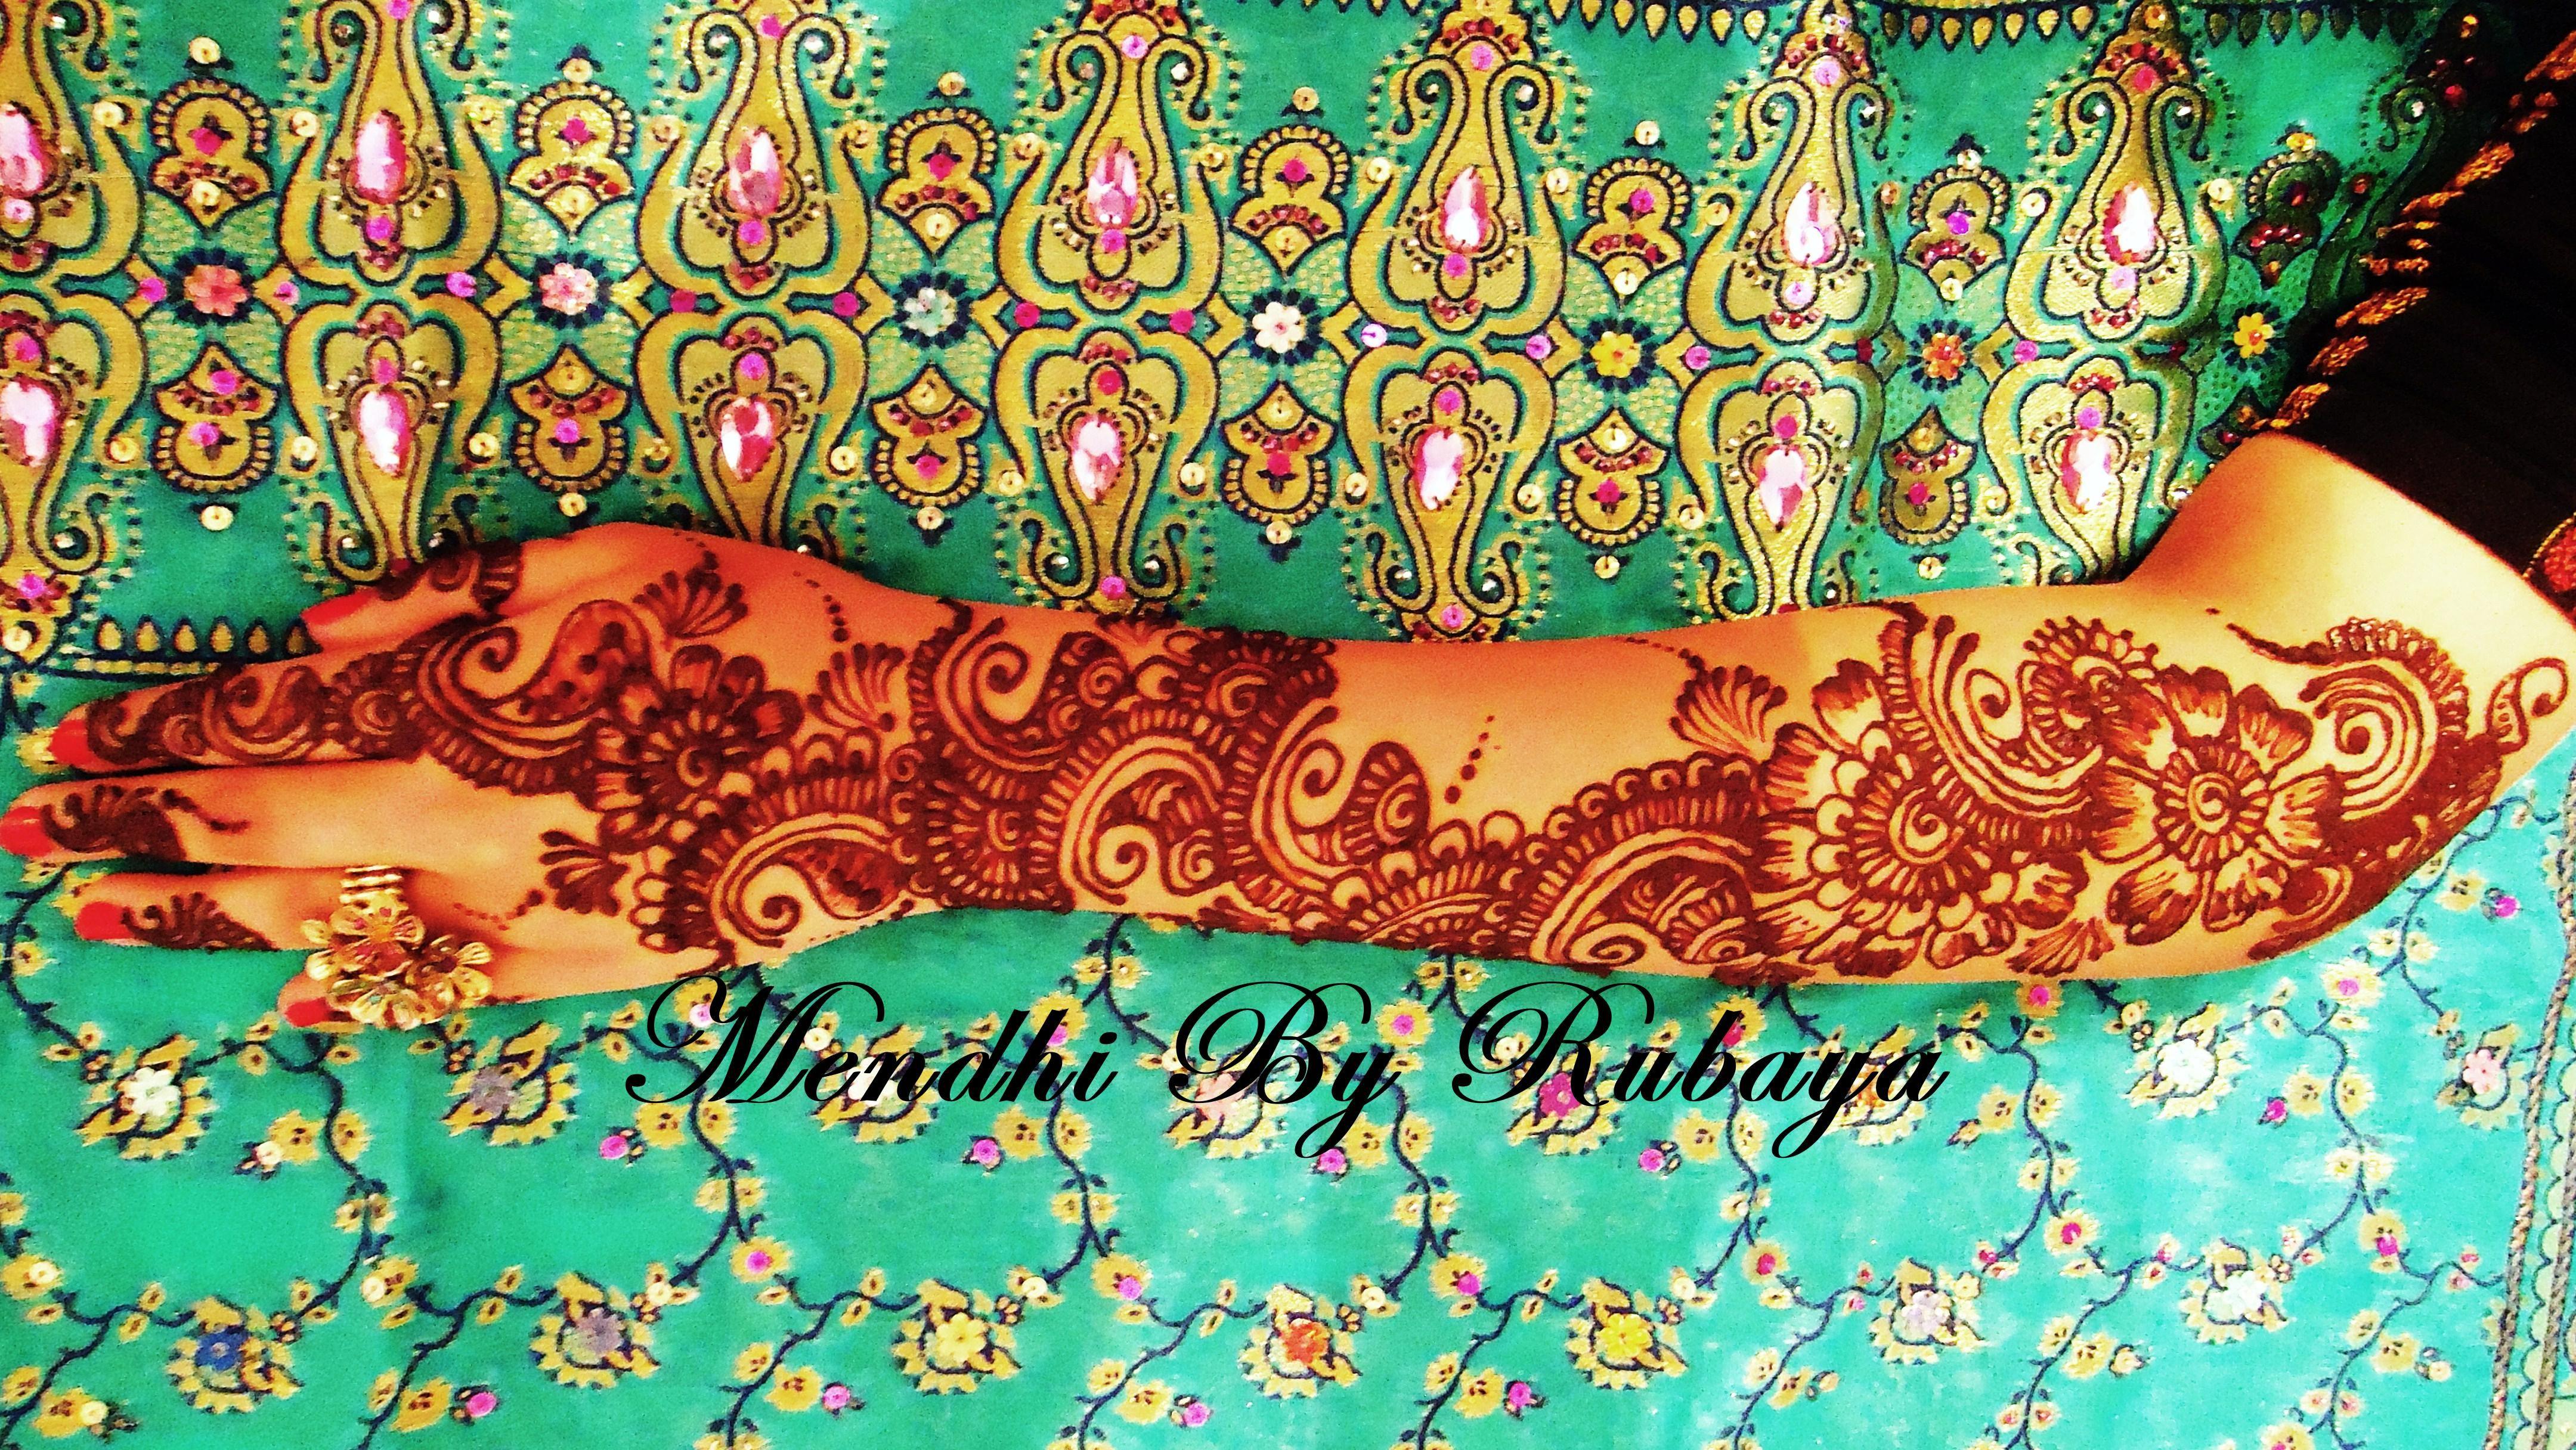 Pin By Rubaya Mendhi On Mehndi By Rubaya  Pinterest